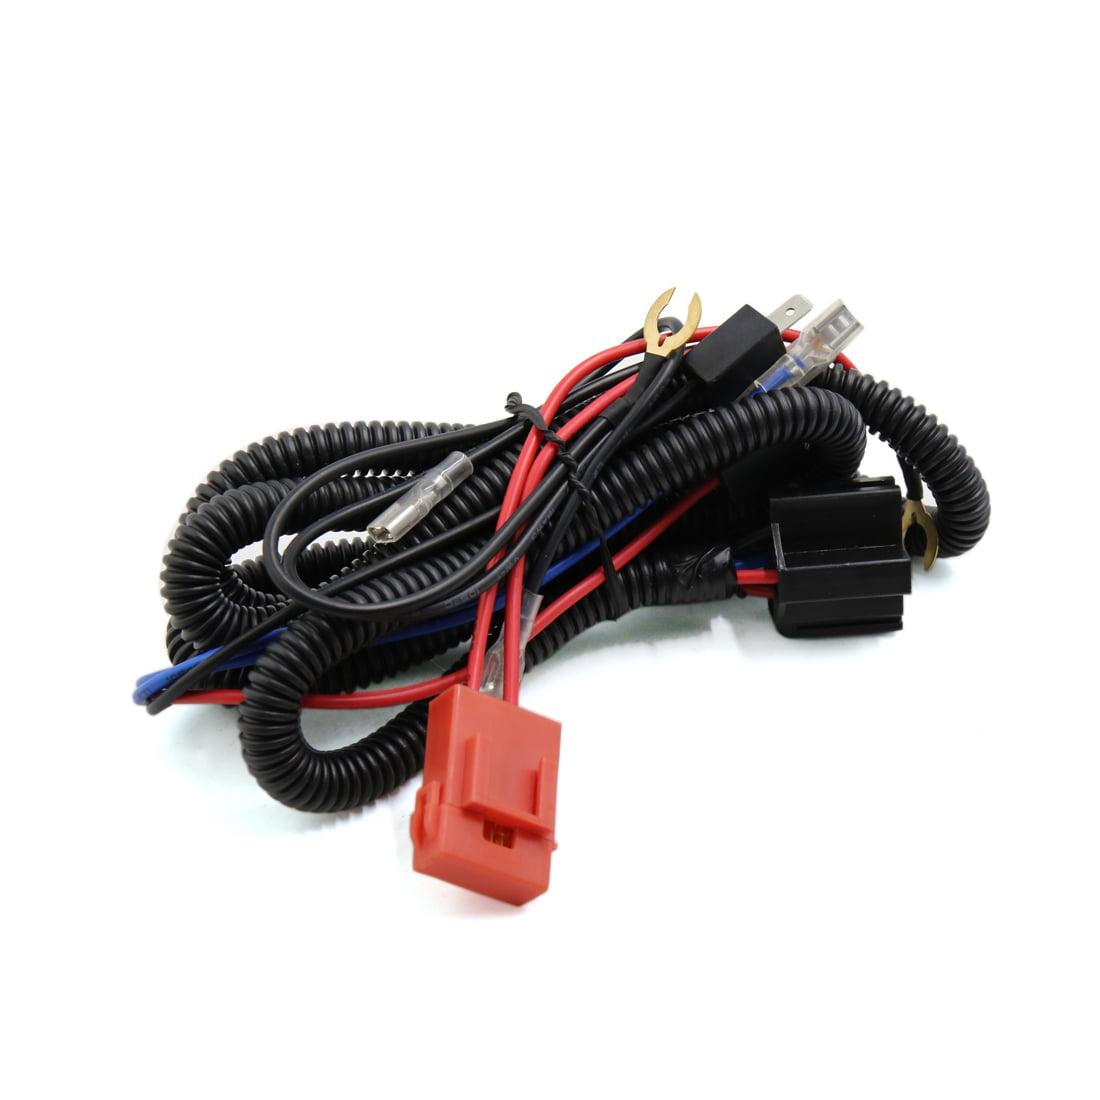 car vehicle horn speaker wiring female terminal adapter connector rh walmart ca Series Wiring Speakers in Car Series Wiring Speakers in Car